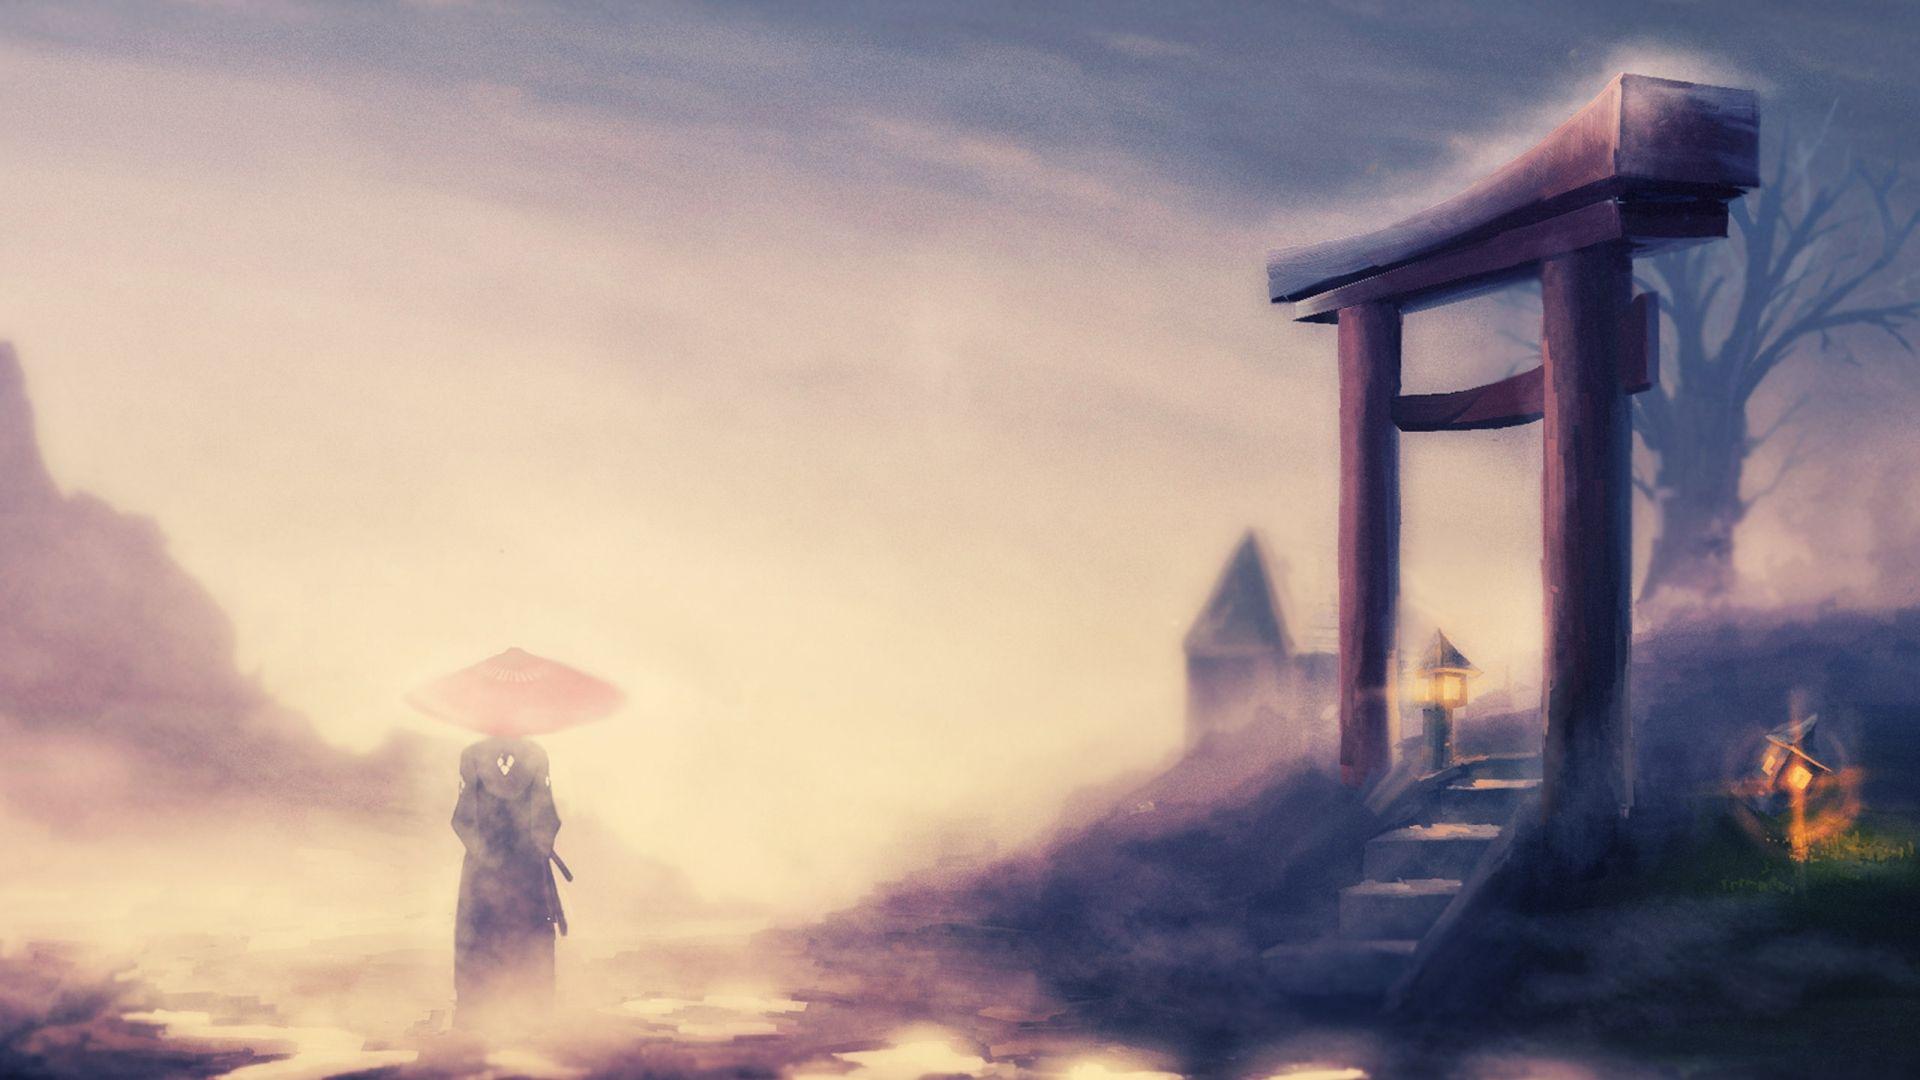 samurai wallpaper Pesquisa Google Tapety Pinterest Samurai